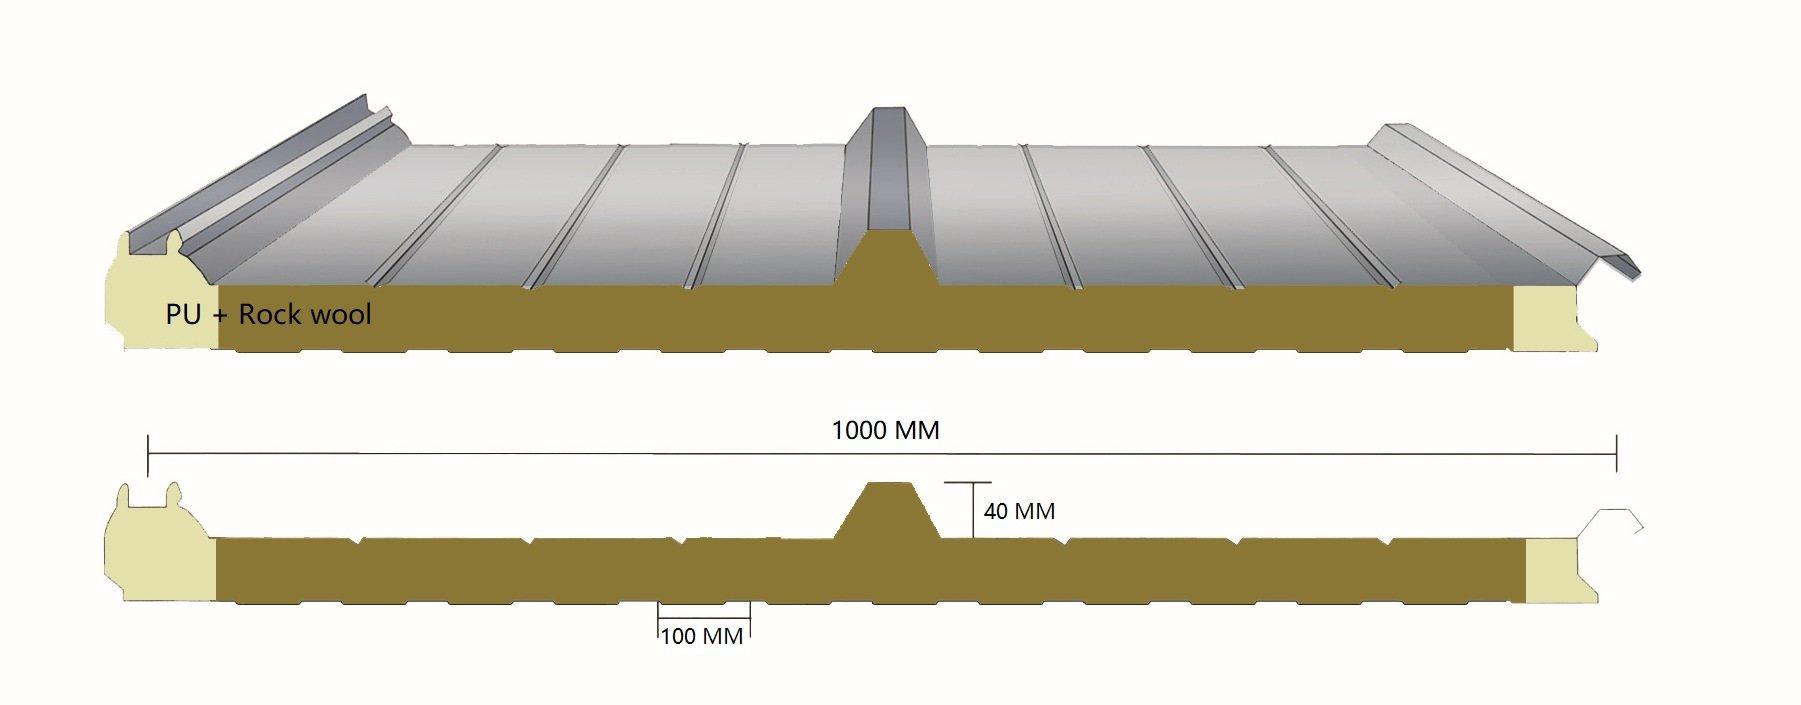 rockwool-core-roof-sandwich-panel-BRDECO